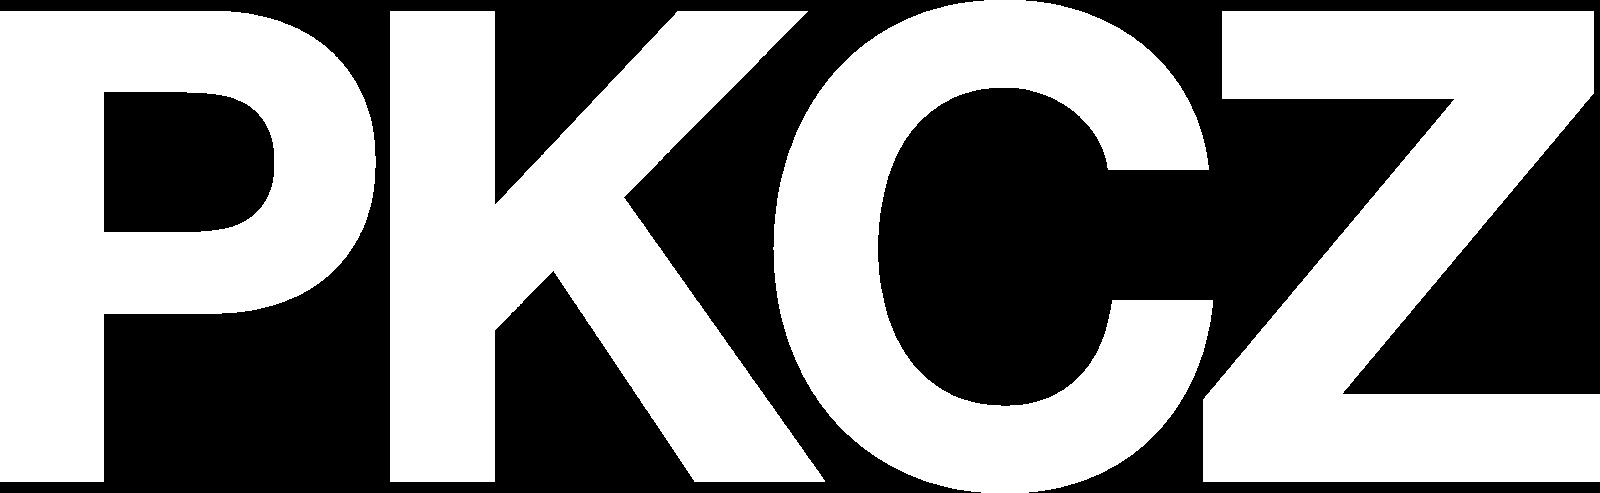 bigbang ロゴ フォント